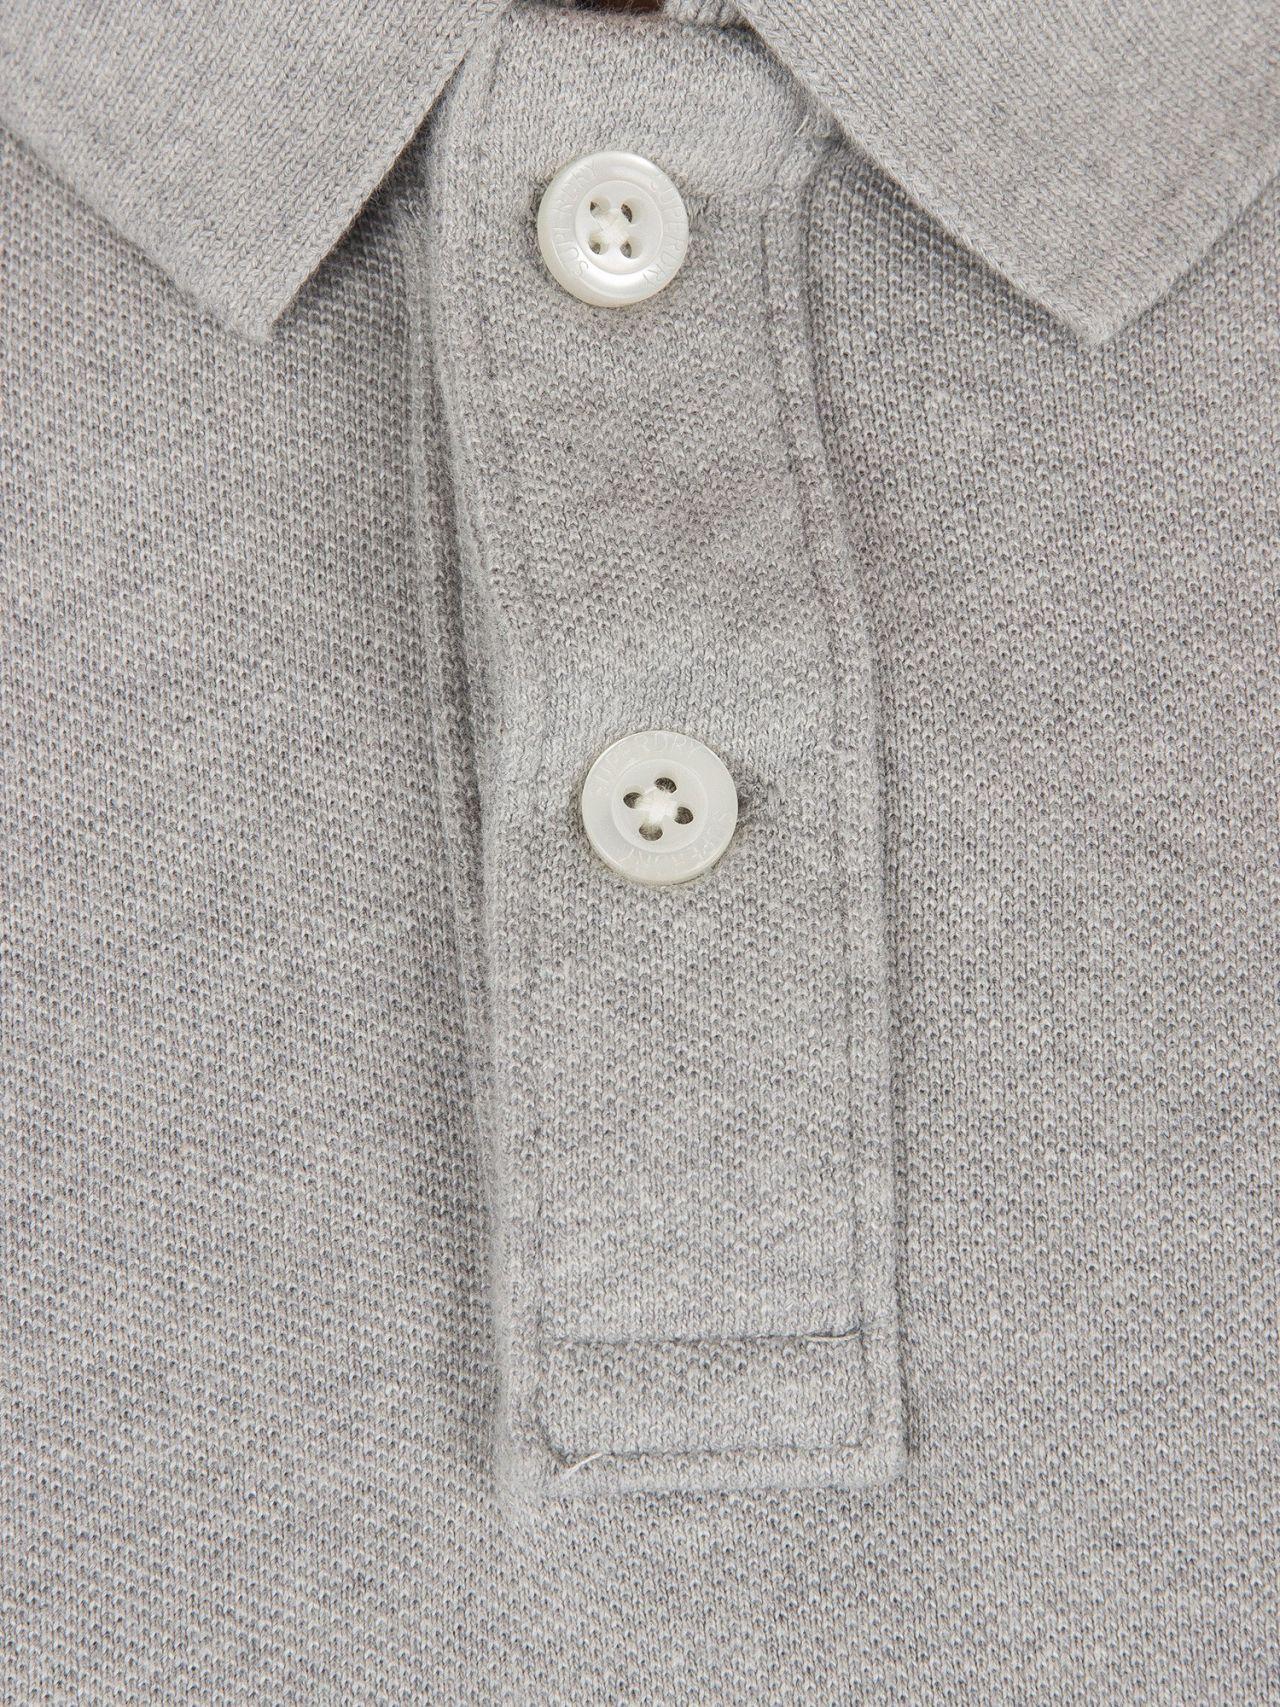 07c820d7a Superdry Grey Marl Classic Pique Logo Polo Shirt